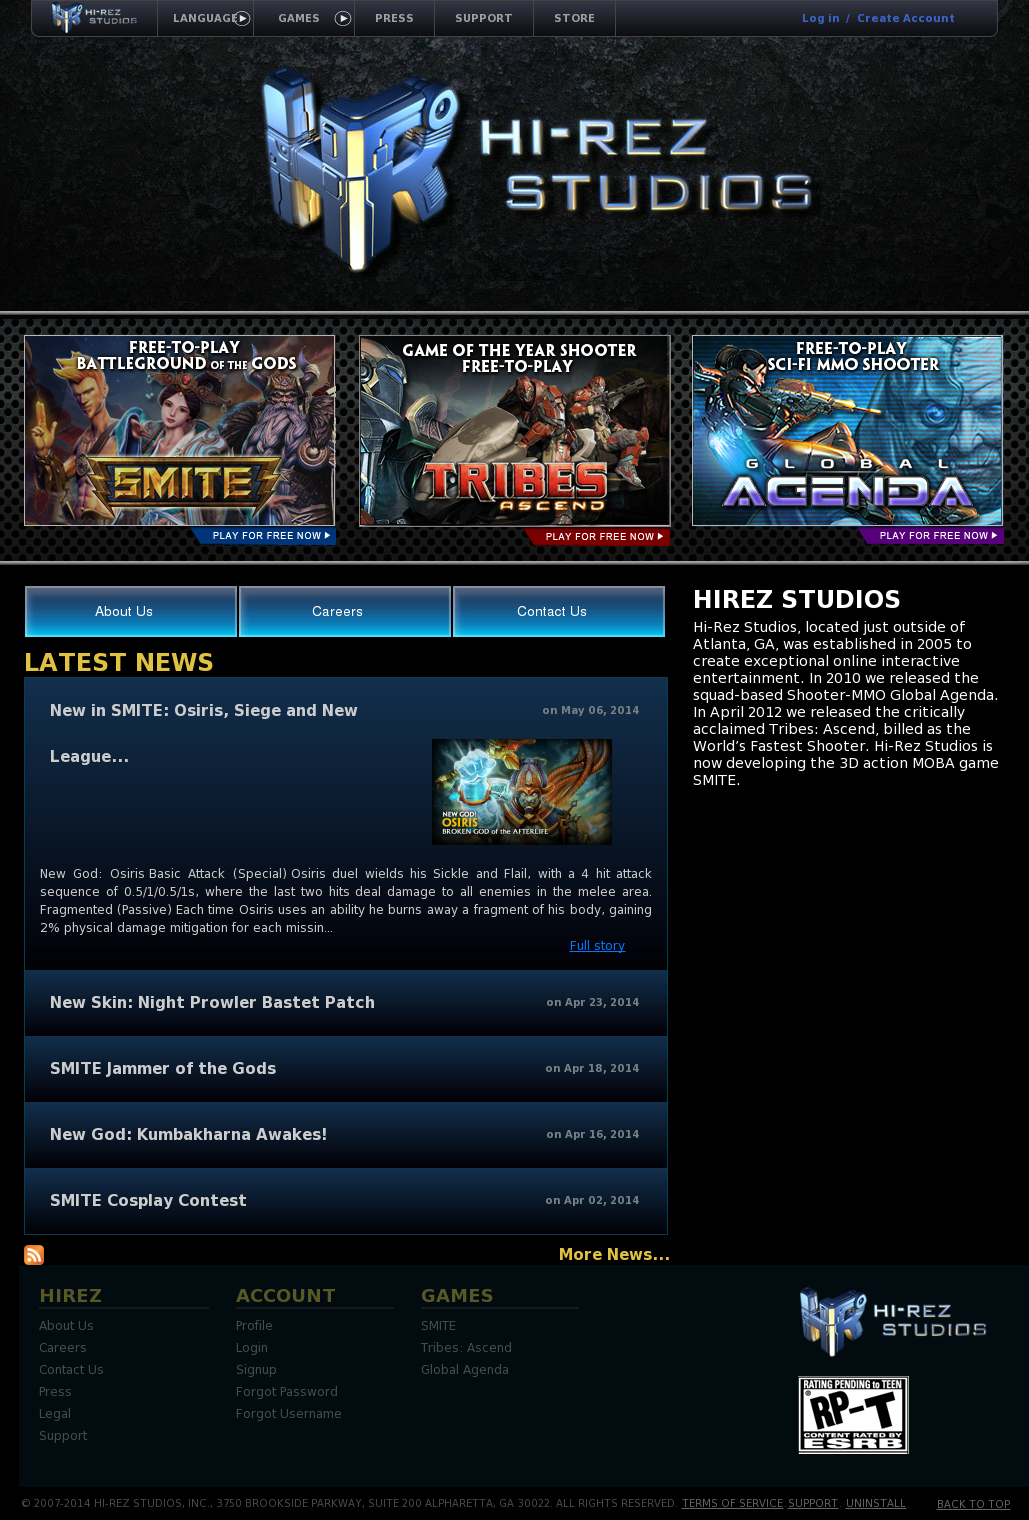 Hi-Rez Studios Competitors, Revenue and Employees - Owler Company